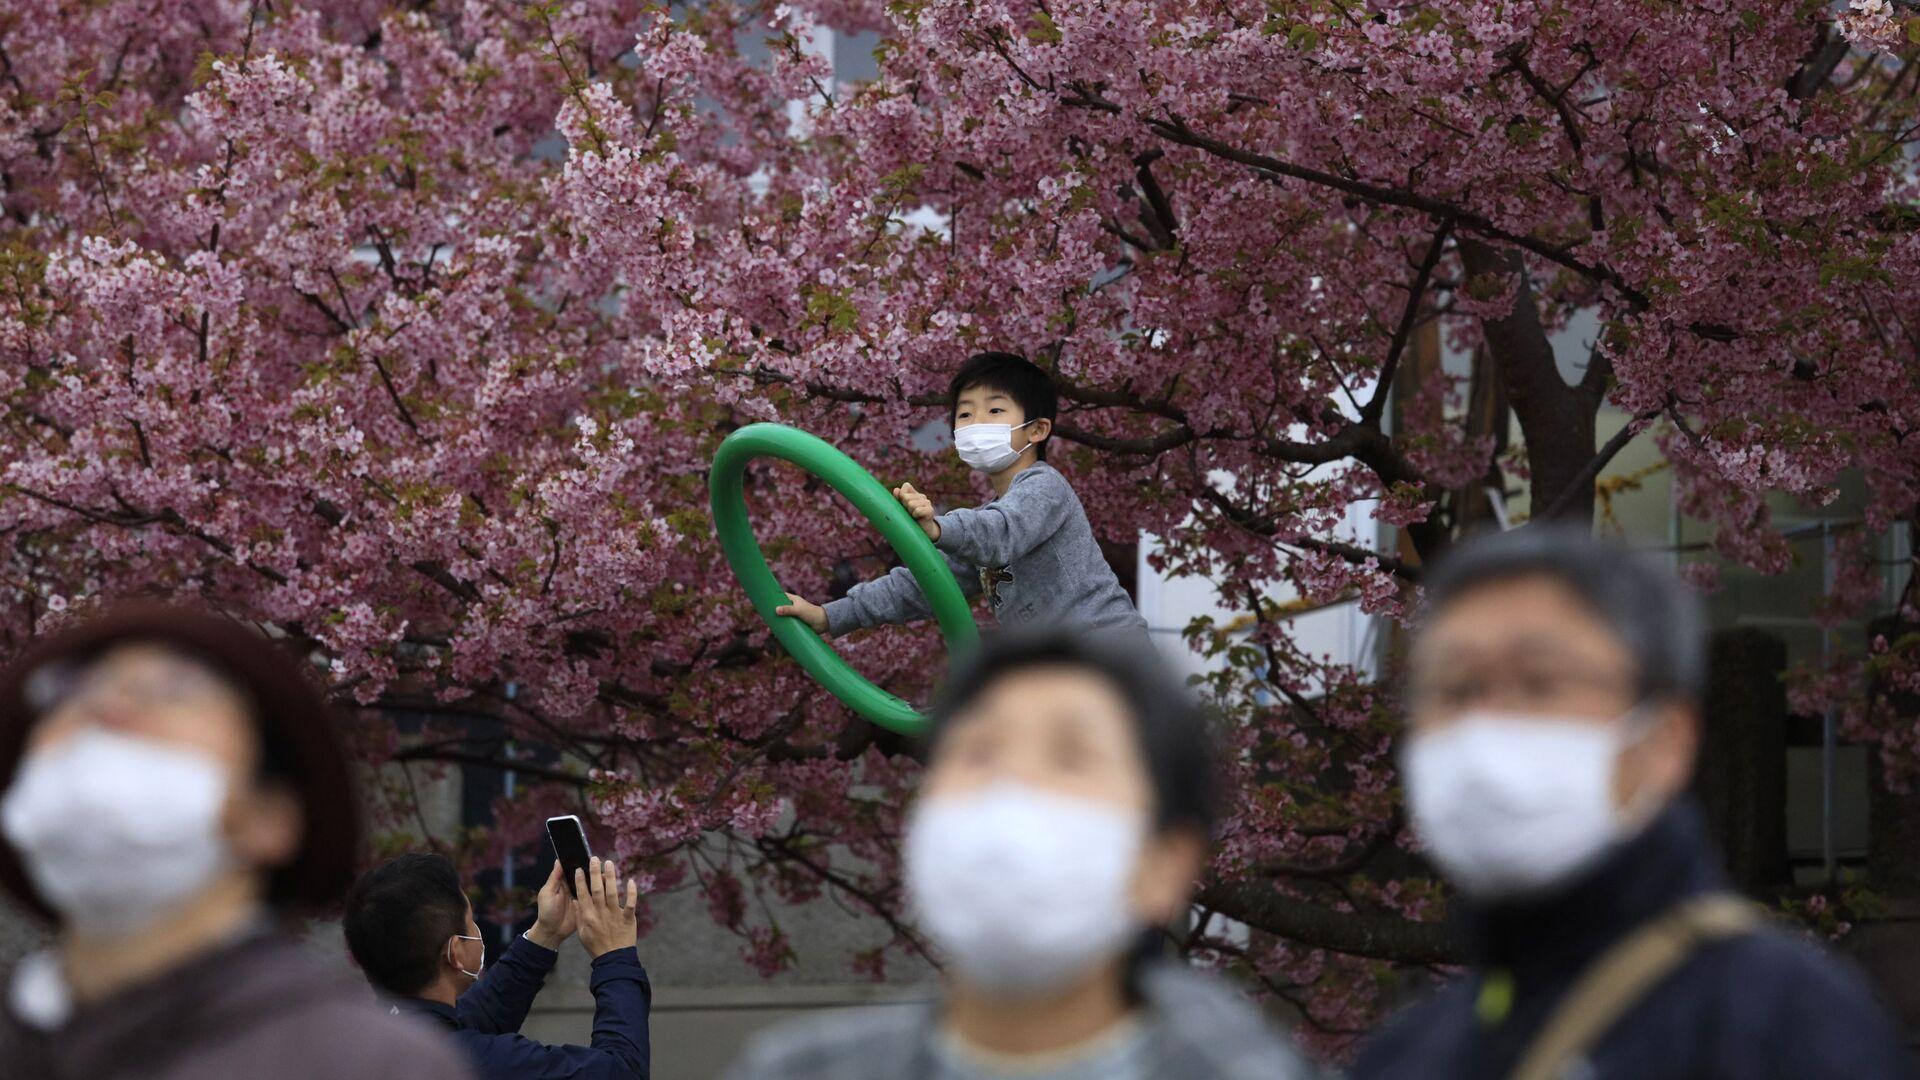 Gente in mascherine in Giappone - Sputnik Italia, 1920, 06.04.2021